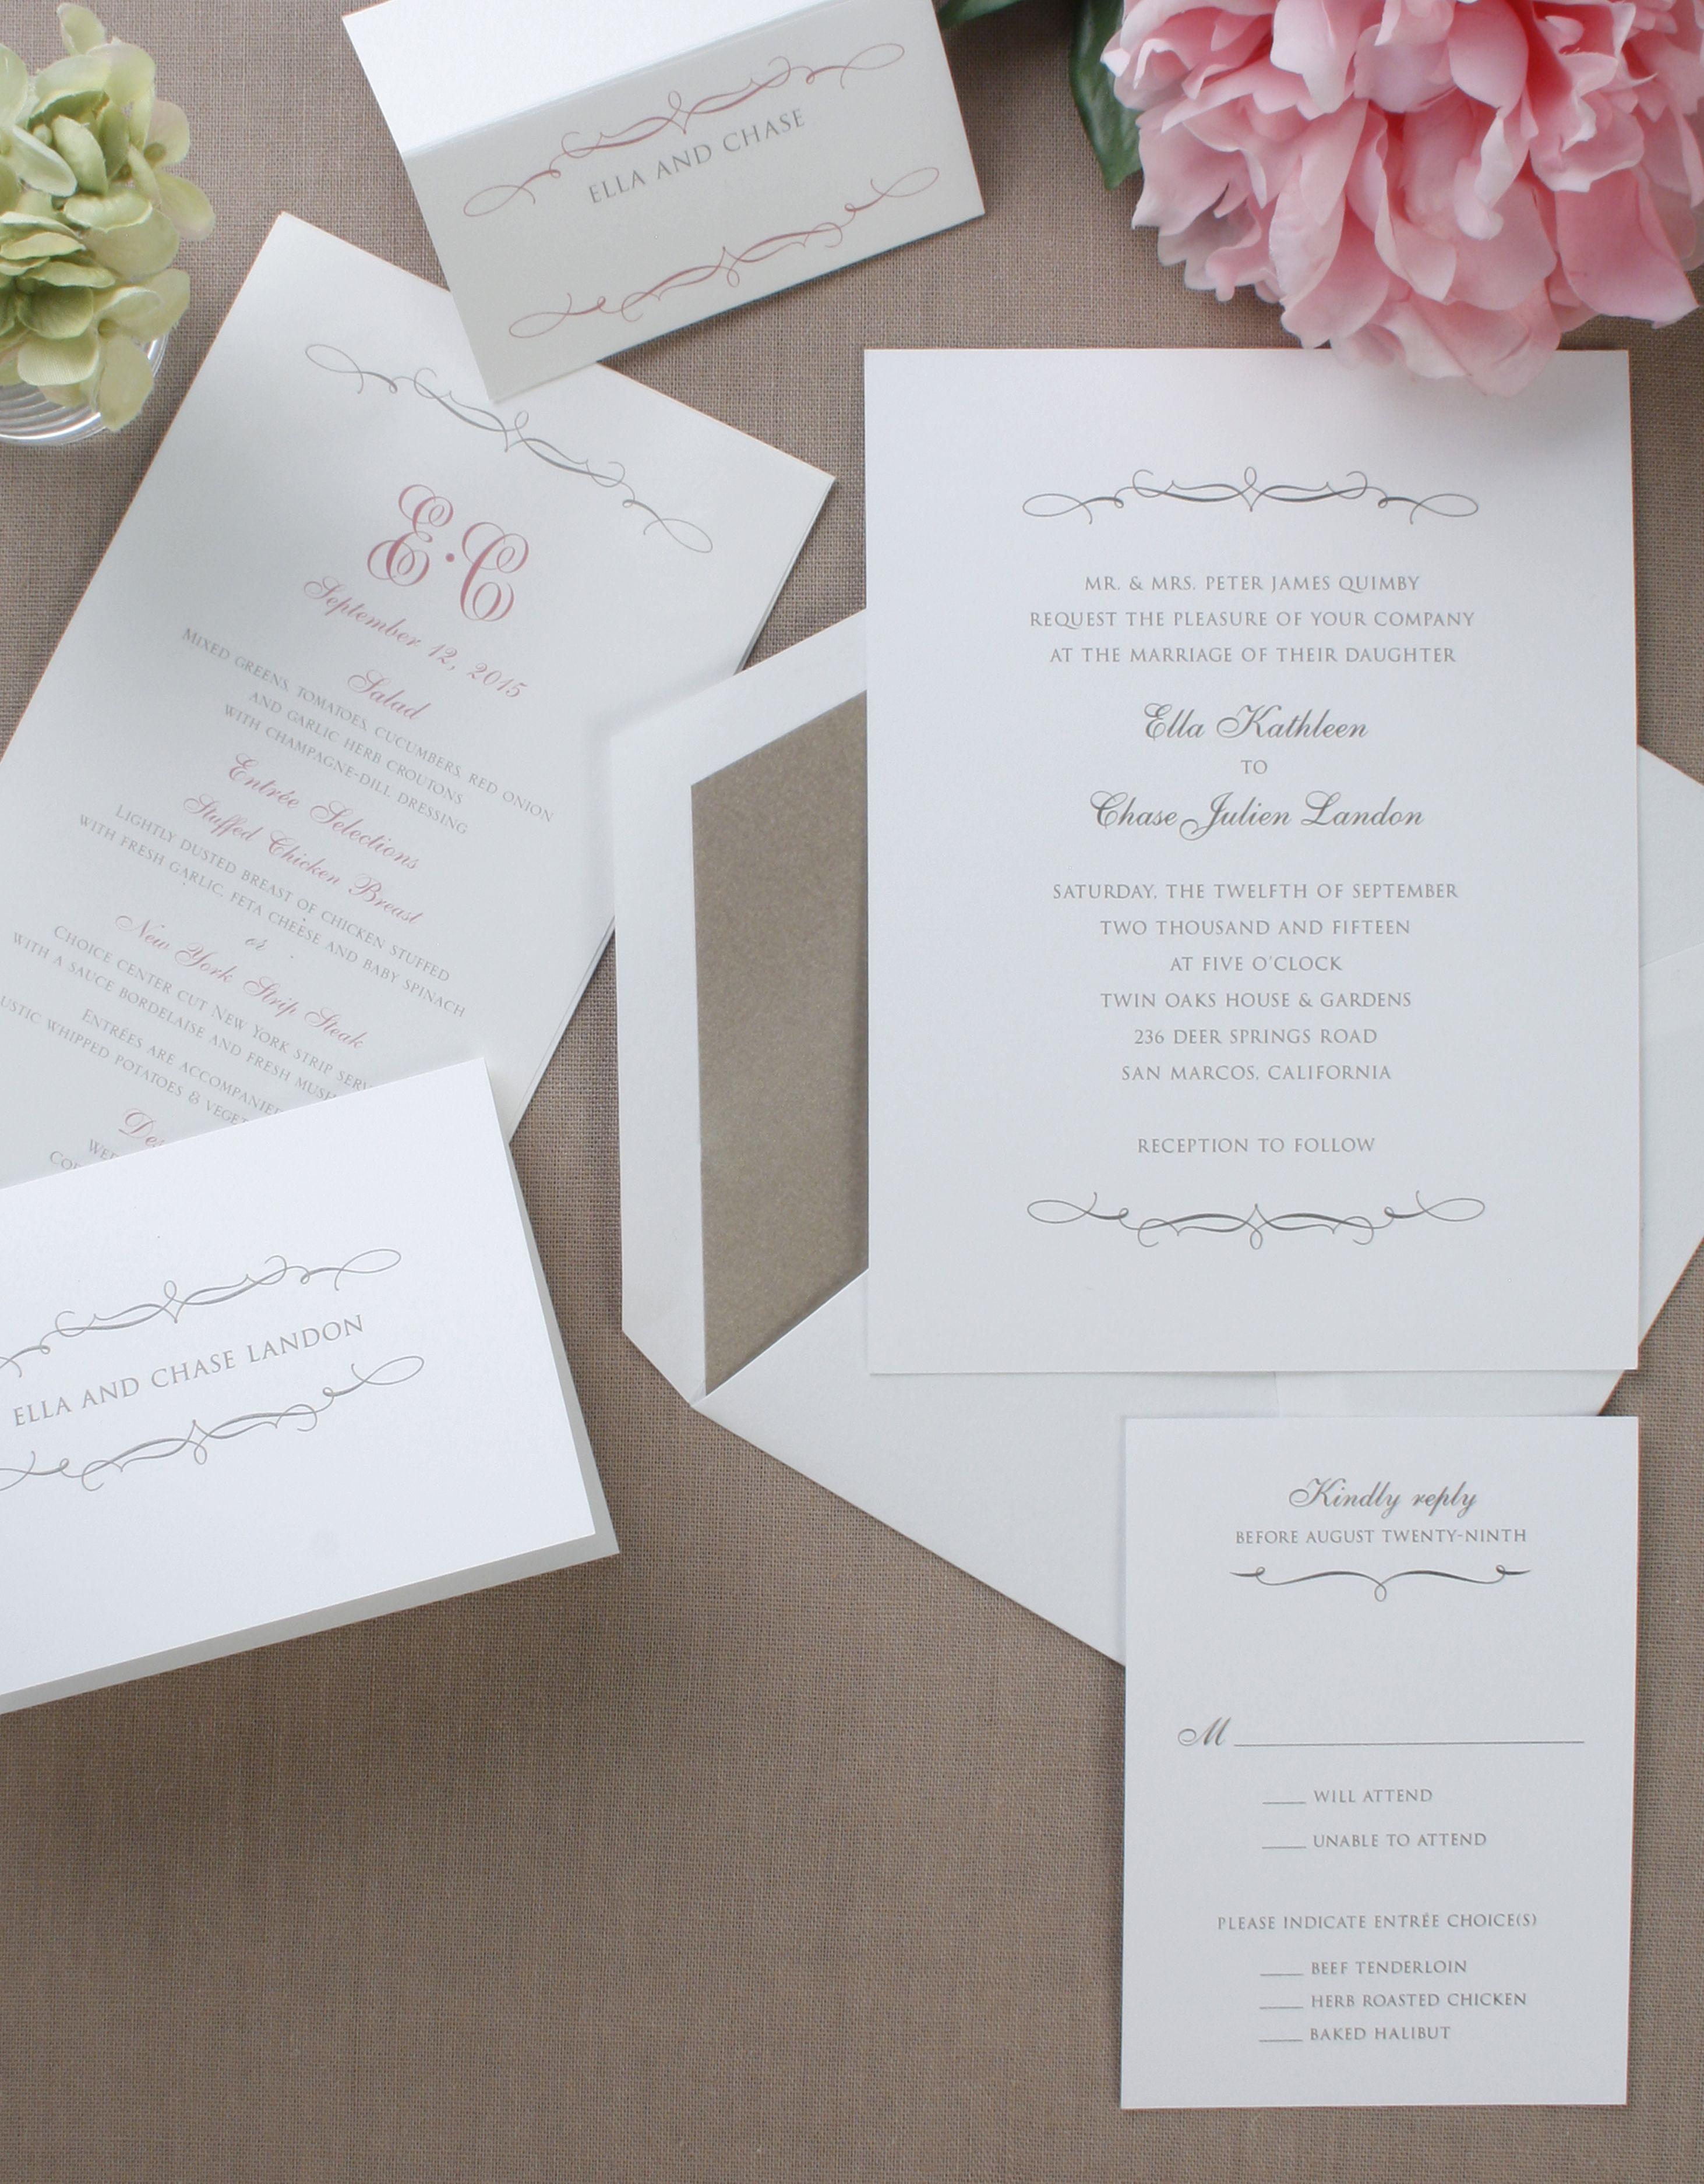 William Arthur Truly   Wedding Invitations   Pinterest   William ...